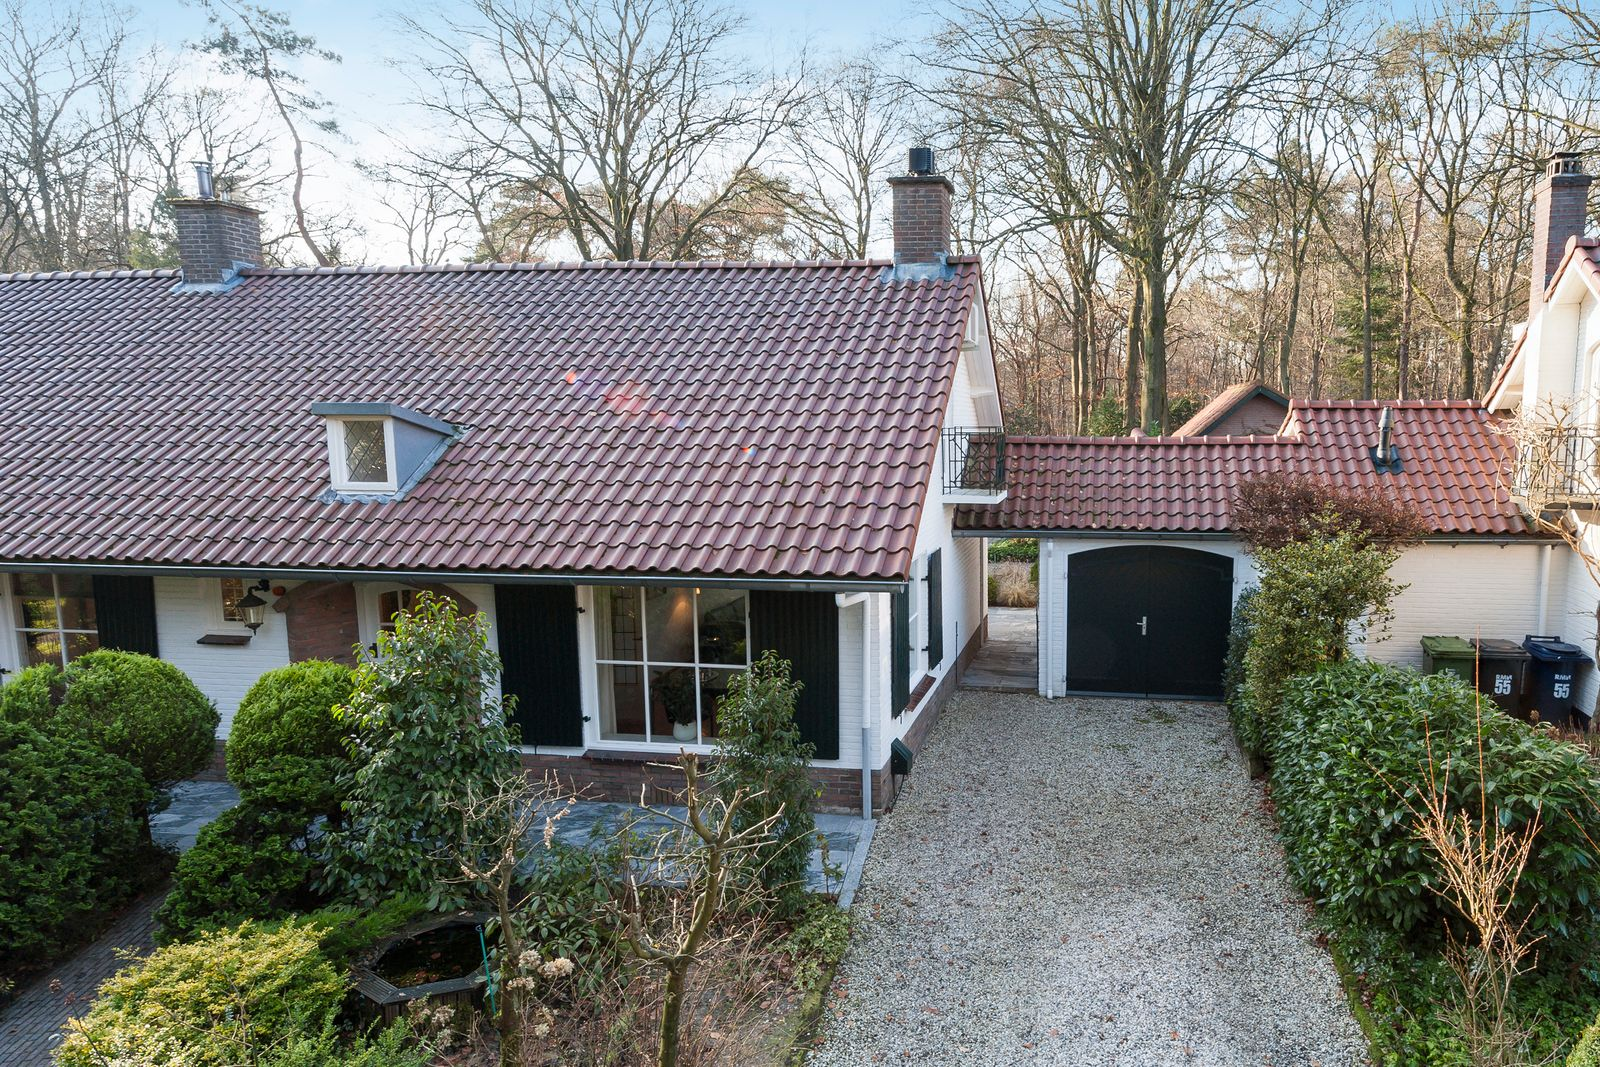 Zonwering Slaapkamer 53 : Ruysdaellaan huis ter heide klaassen makelaars zeist